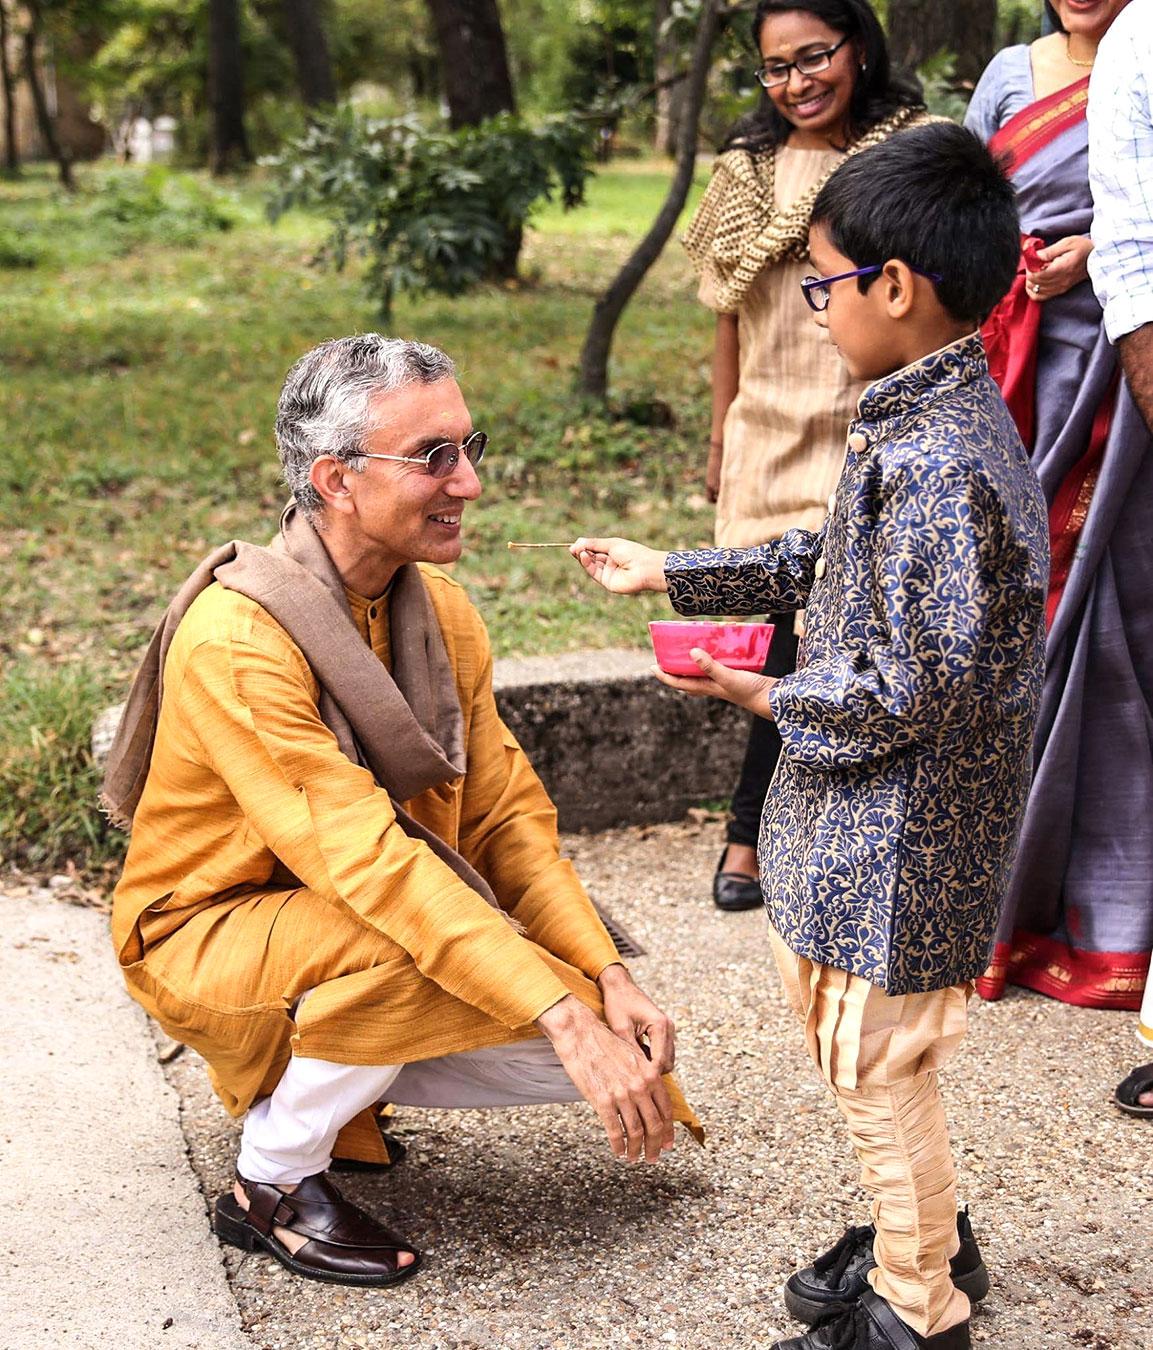 ind-rahul-chhabra-2018-warm-welcome.jpg